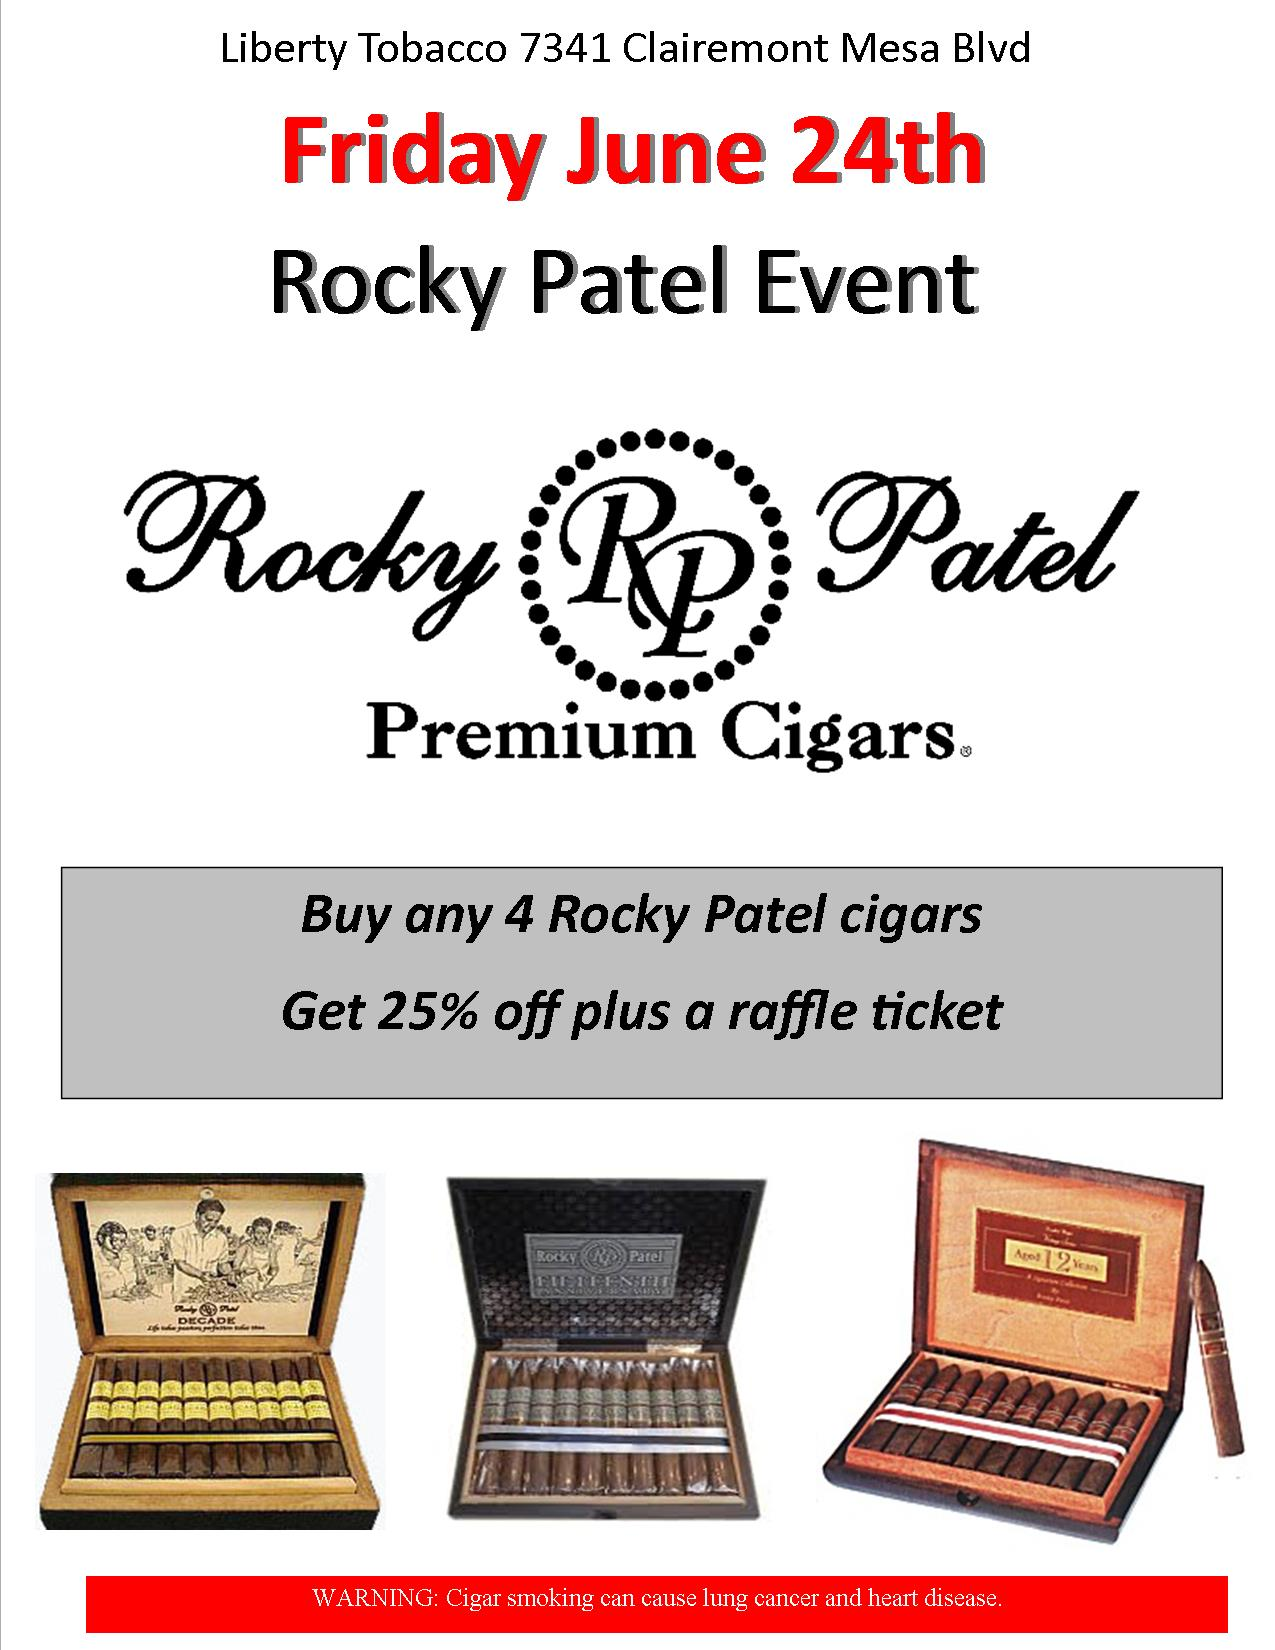 Rocky Patel Event at Liberty Tobacco